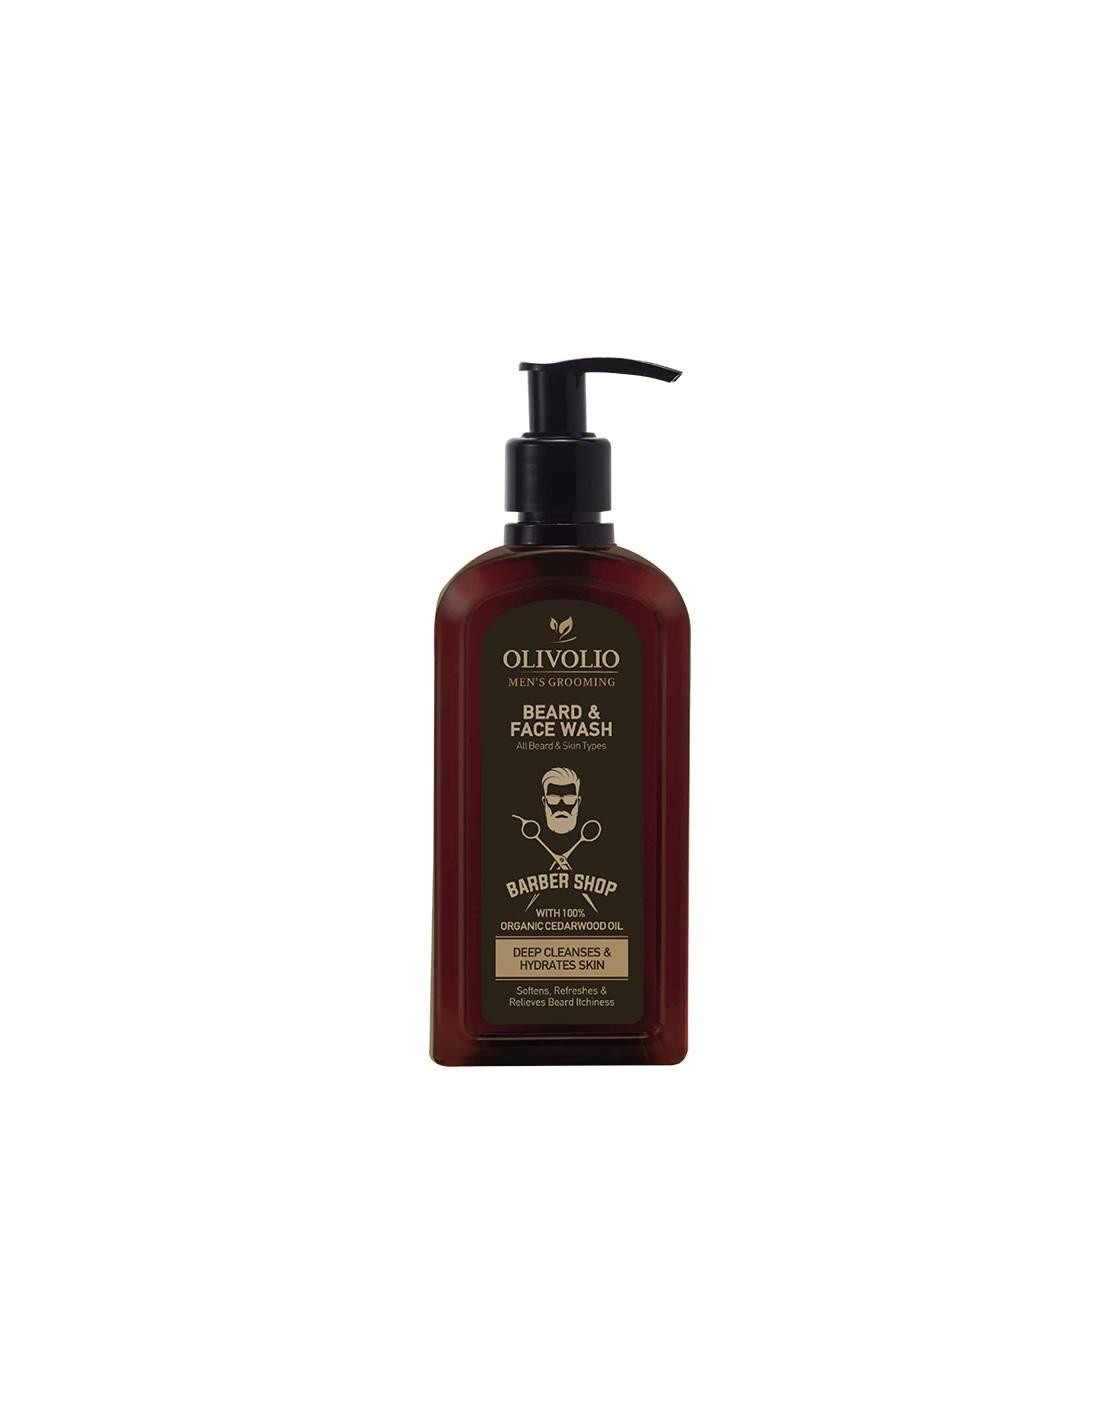 olivolio-beard-face-wash-200-ml.jpg